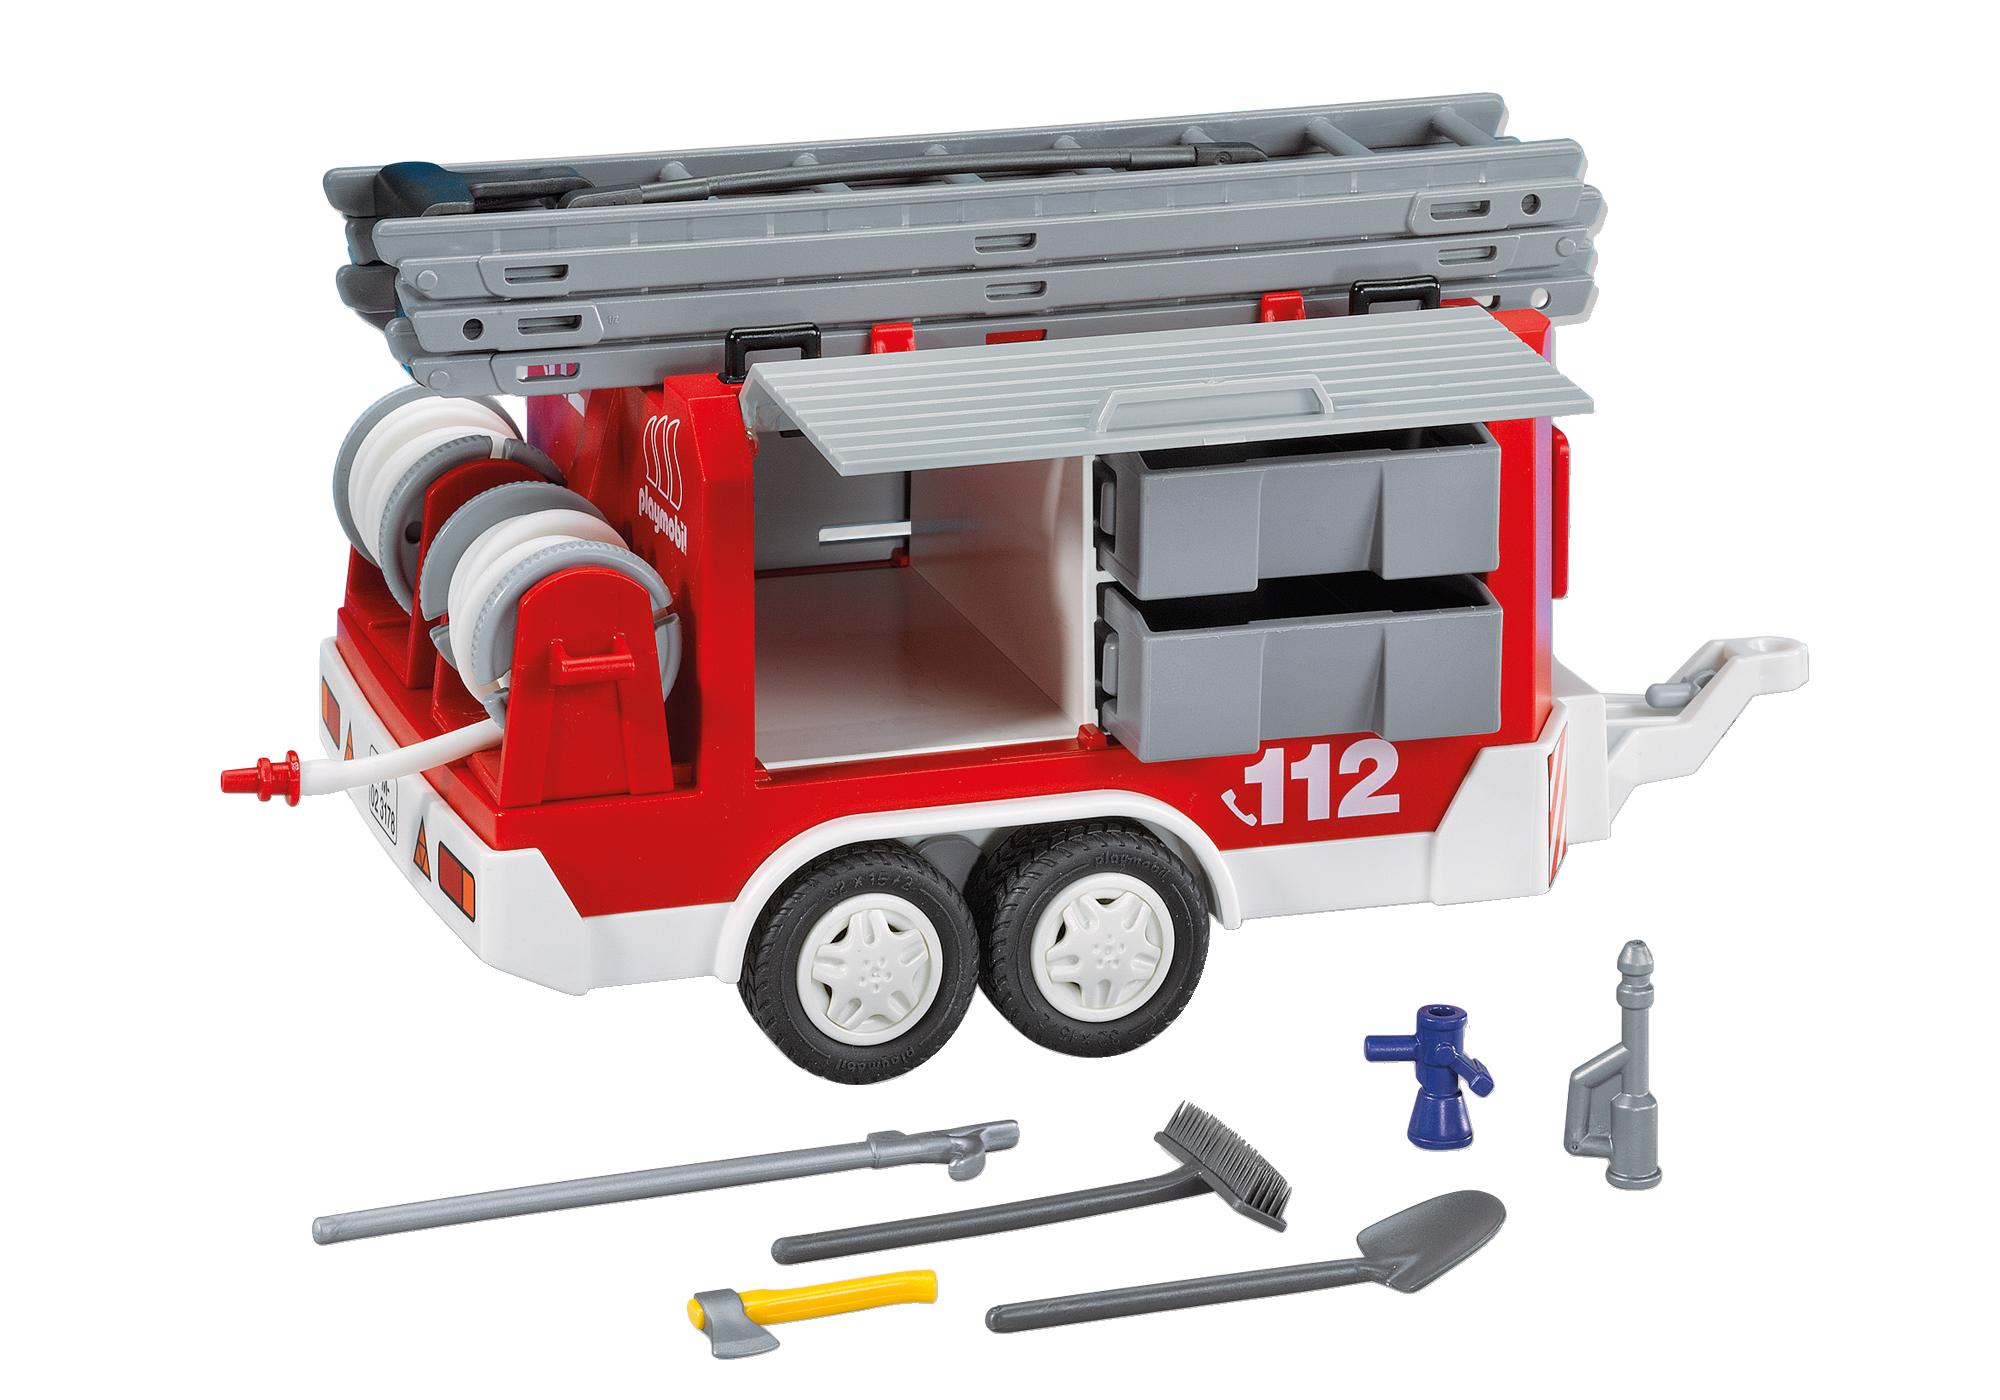 http://media.playmobil.com/i/playmobil/7485_product_detail/Brandweer-aanhangwagen